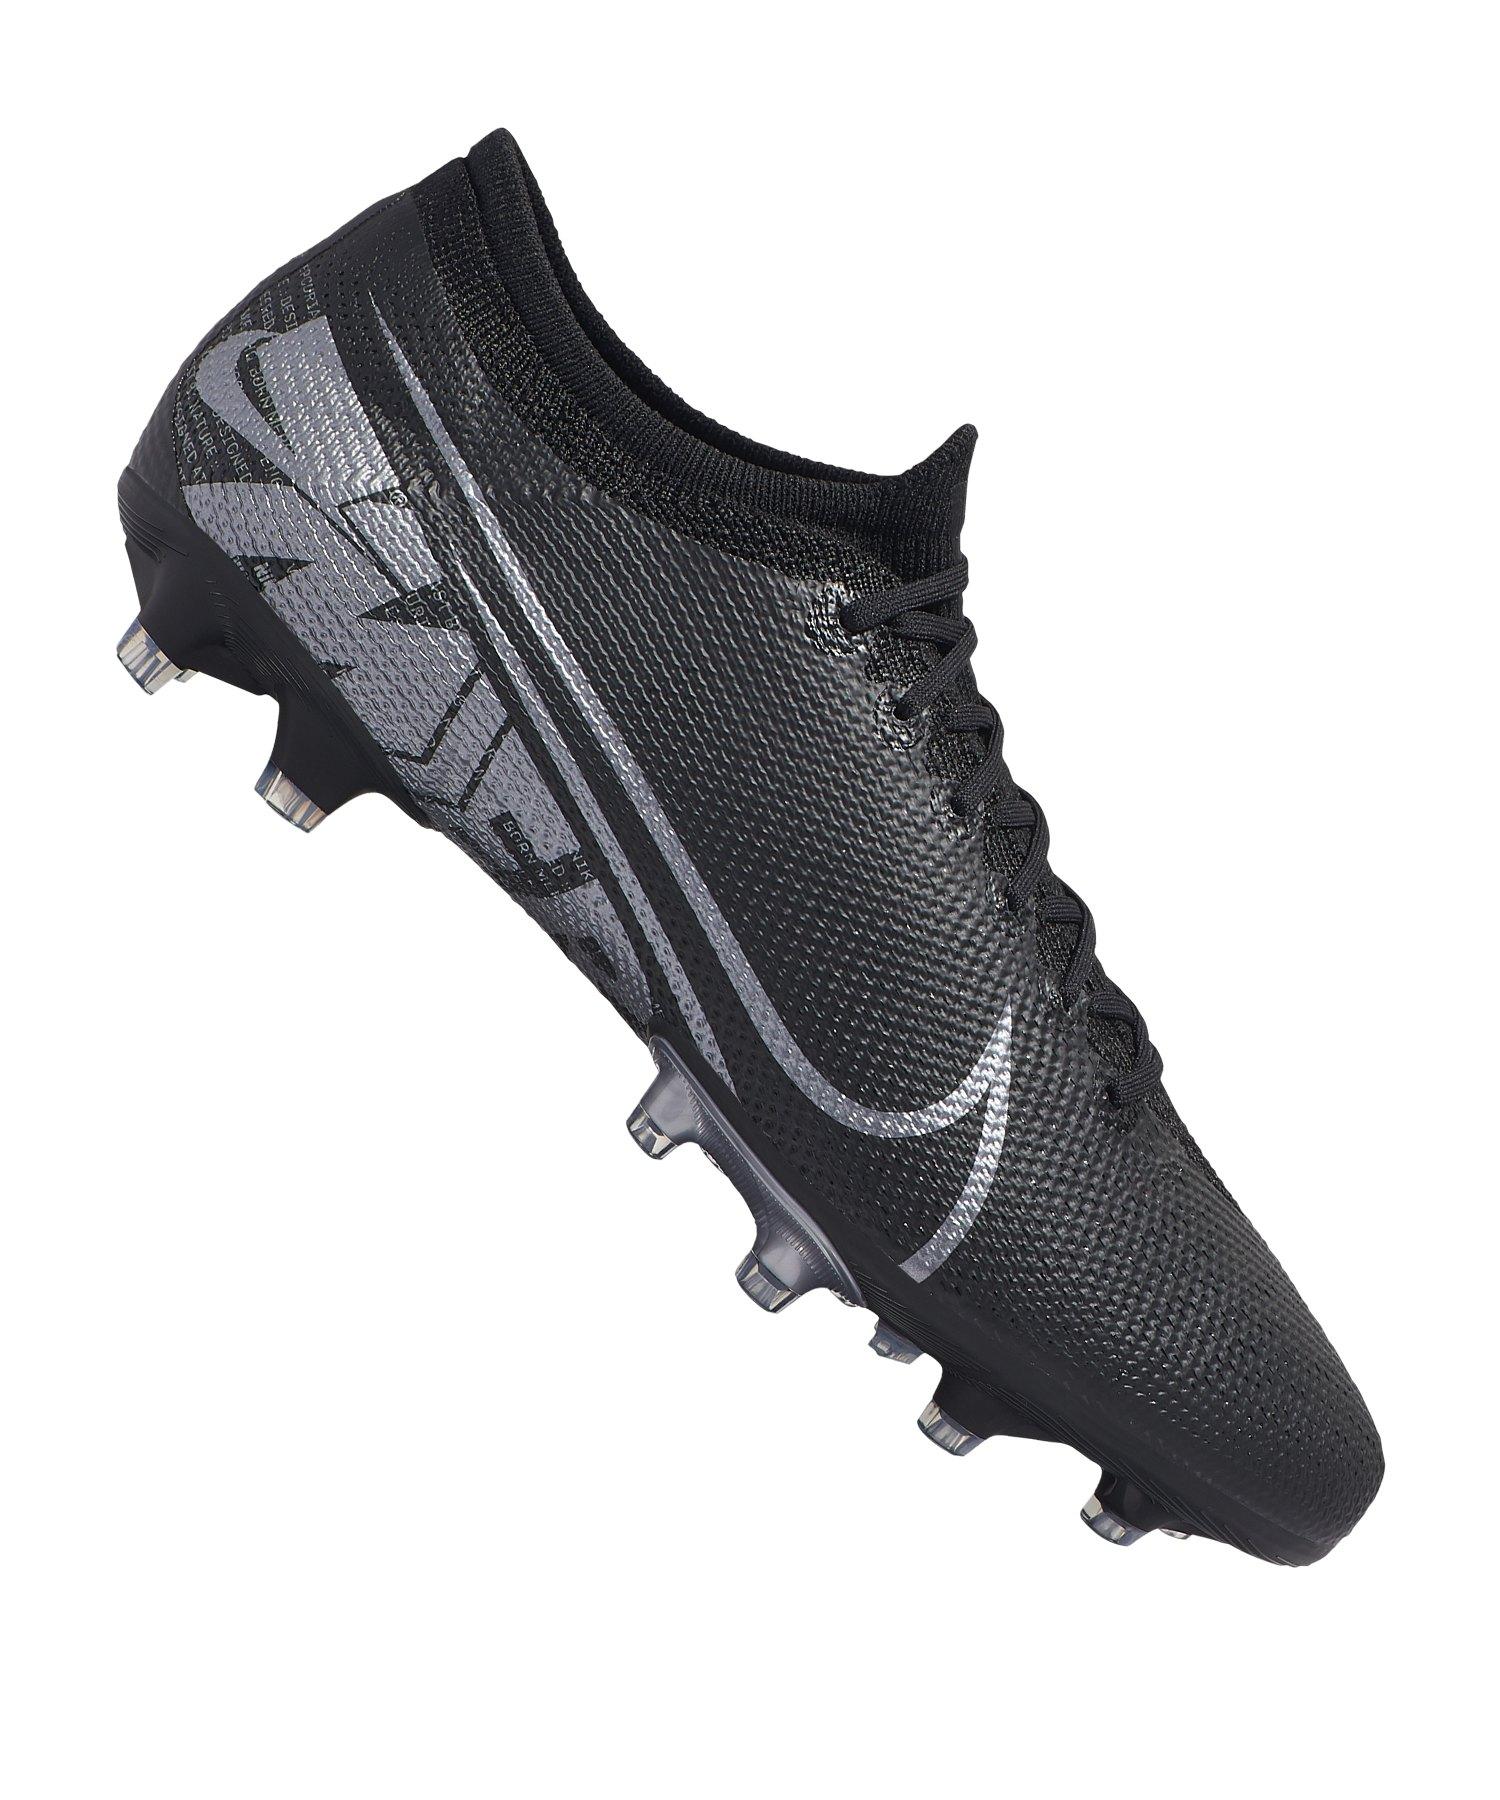 Nike Mercurial Vapor XIII Pro AG-Pro F001 - schwarz